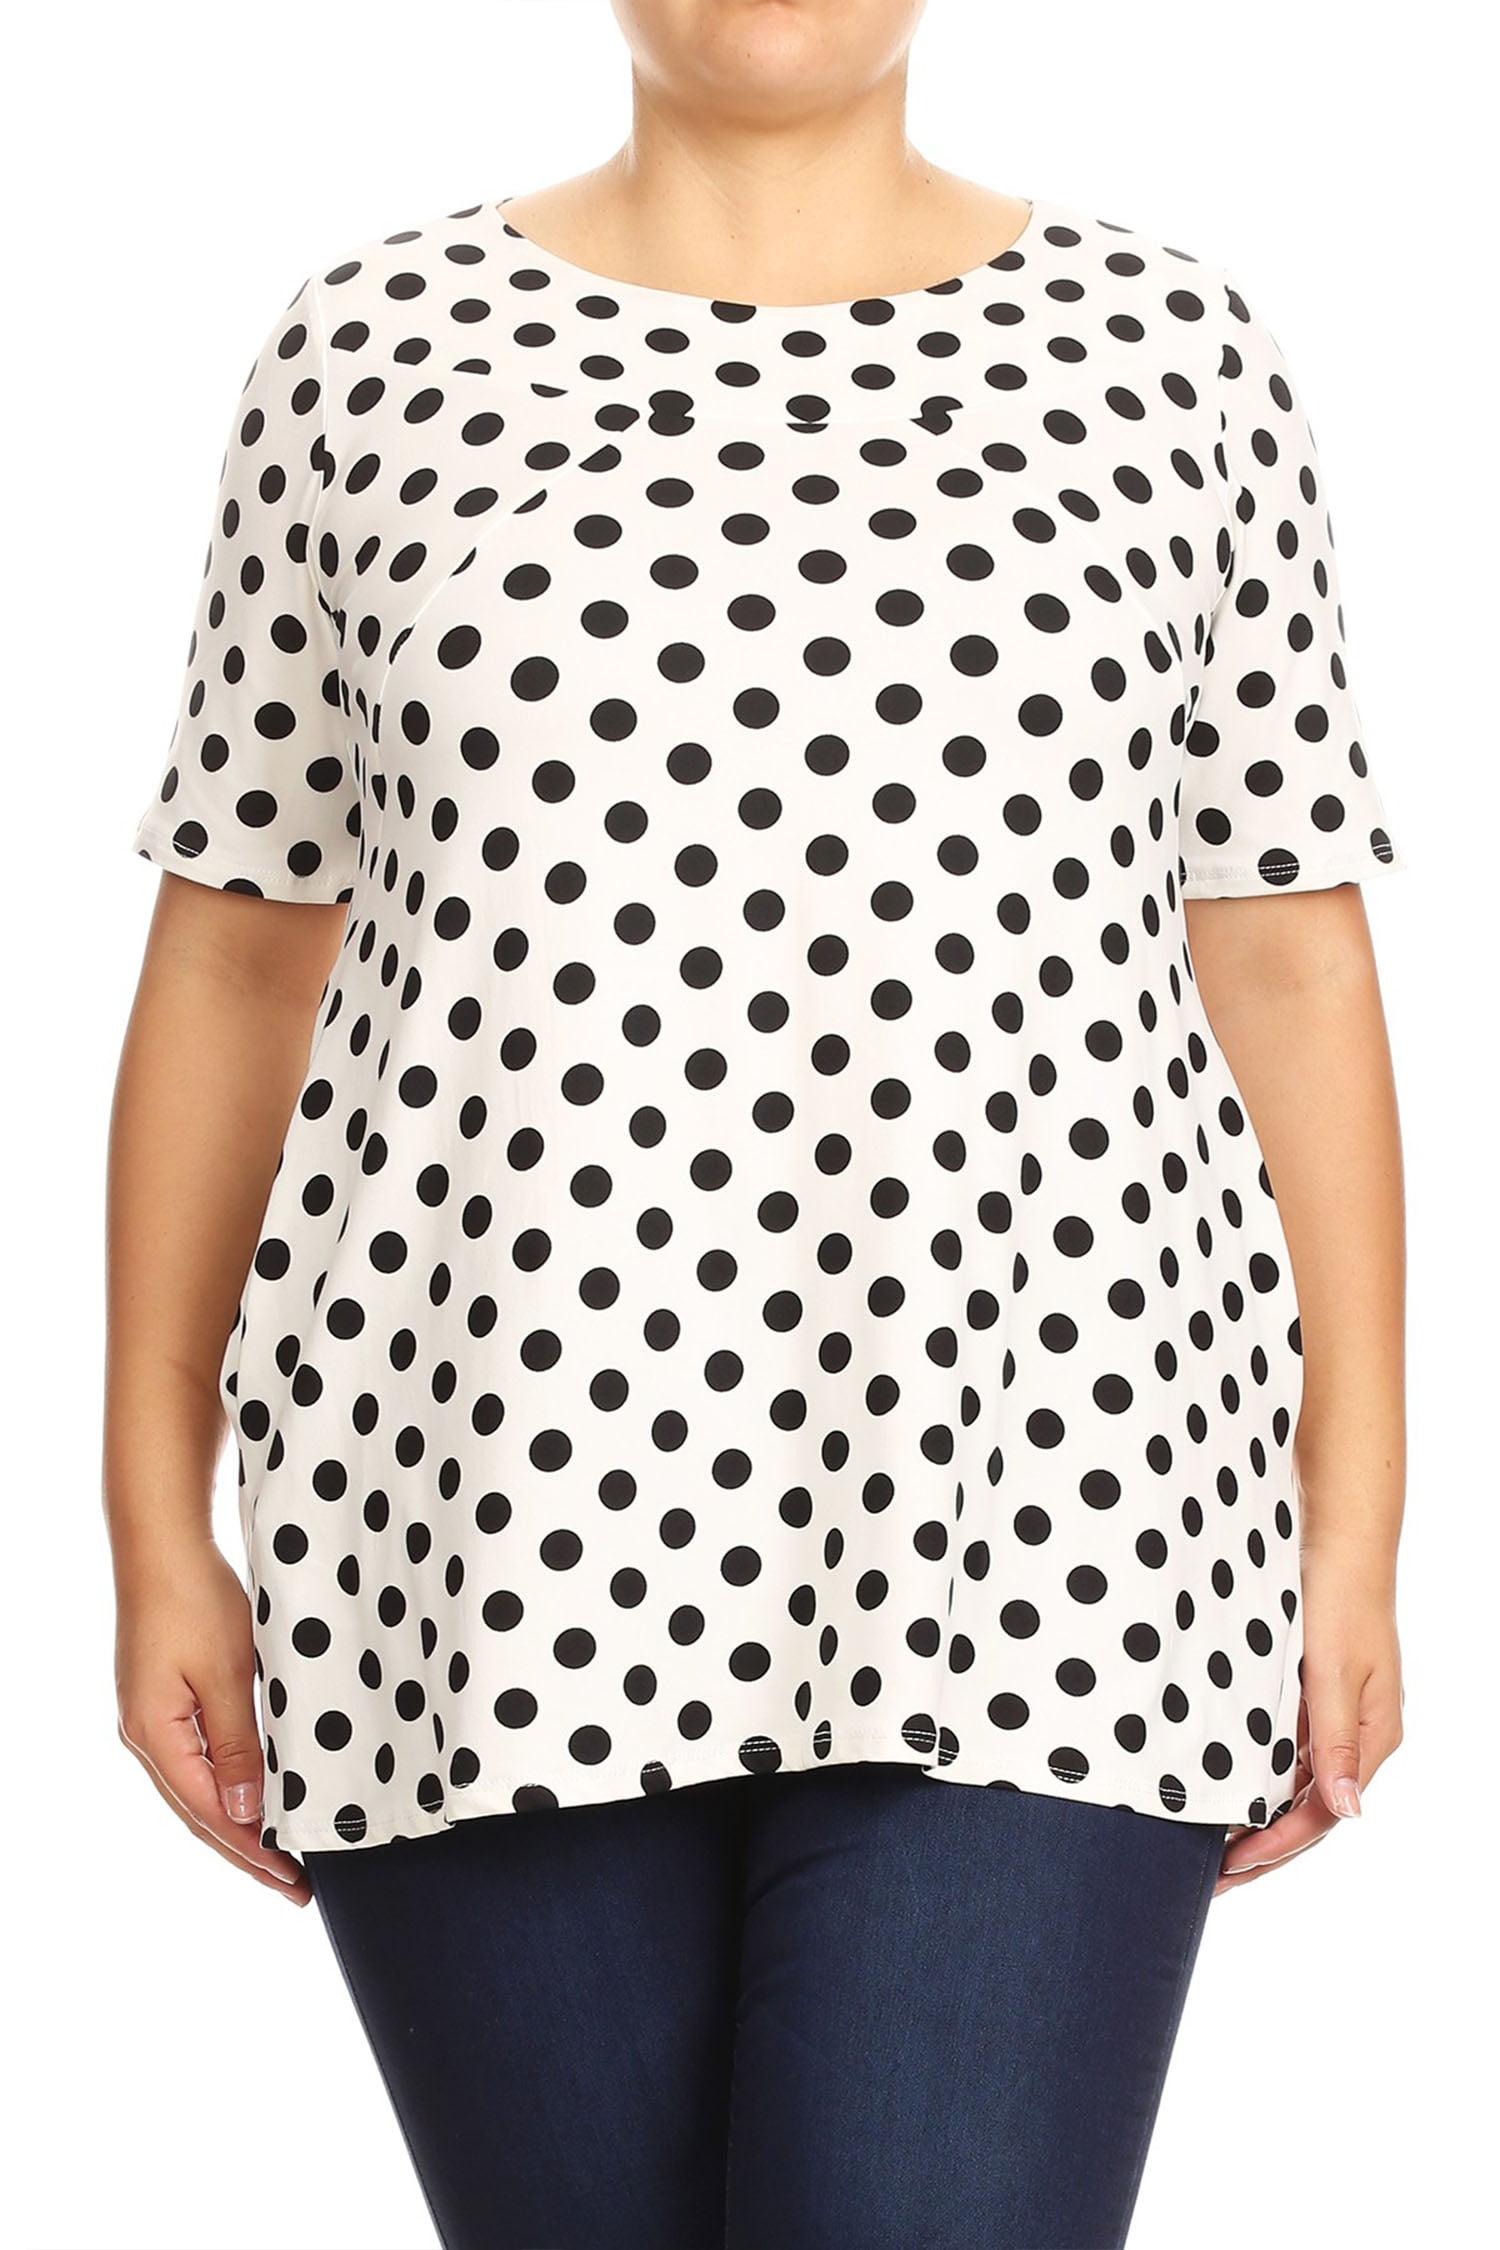 Women's Polka Dot Plus Size Short Sleeve Shirt